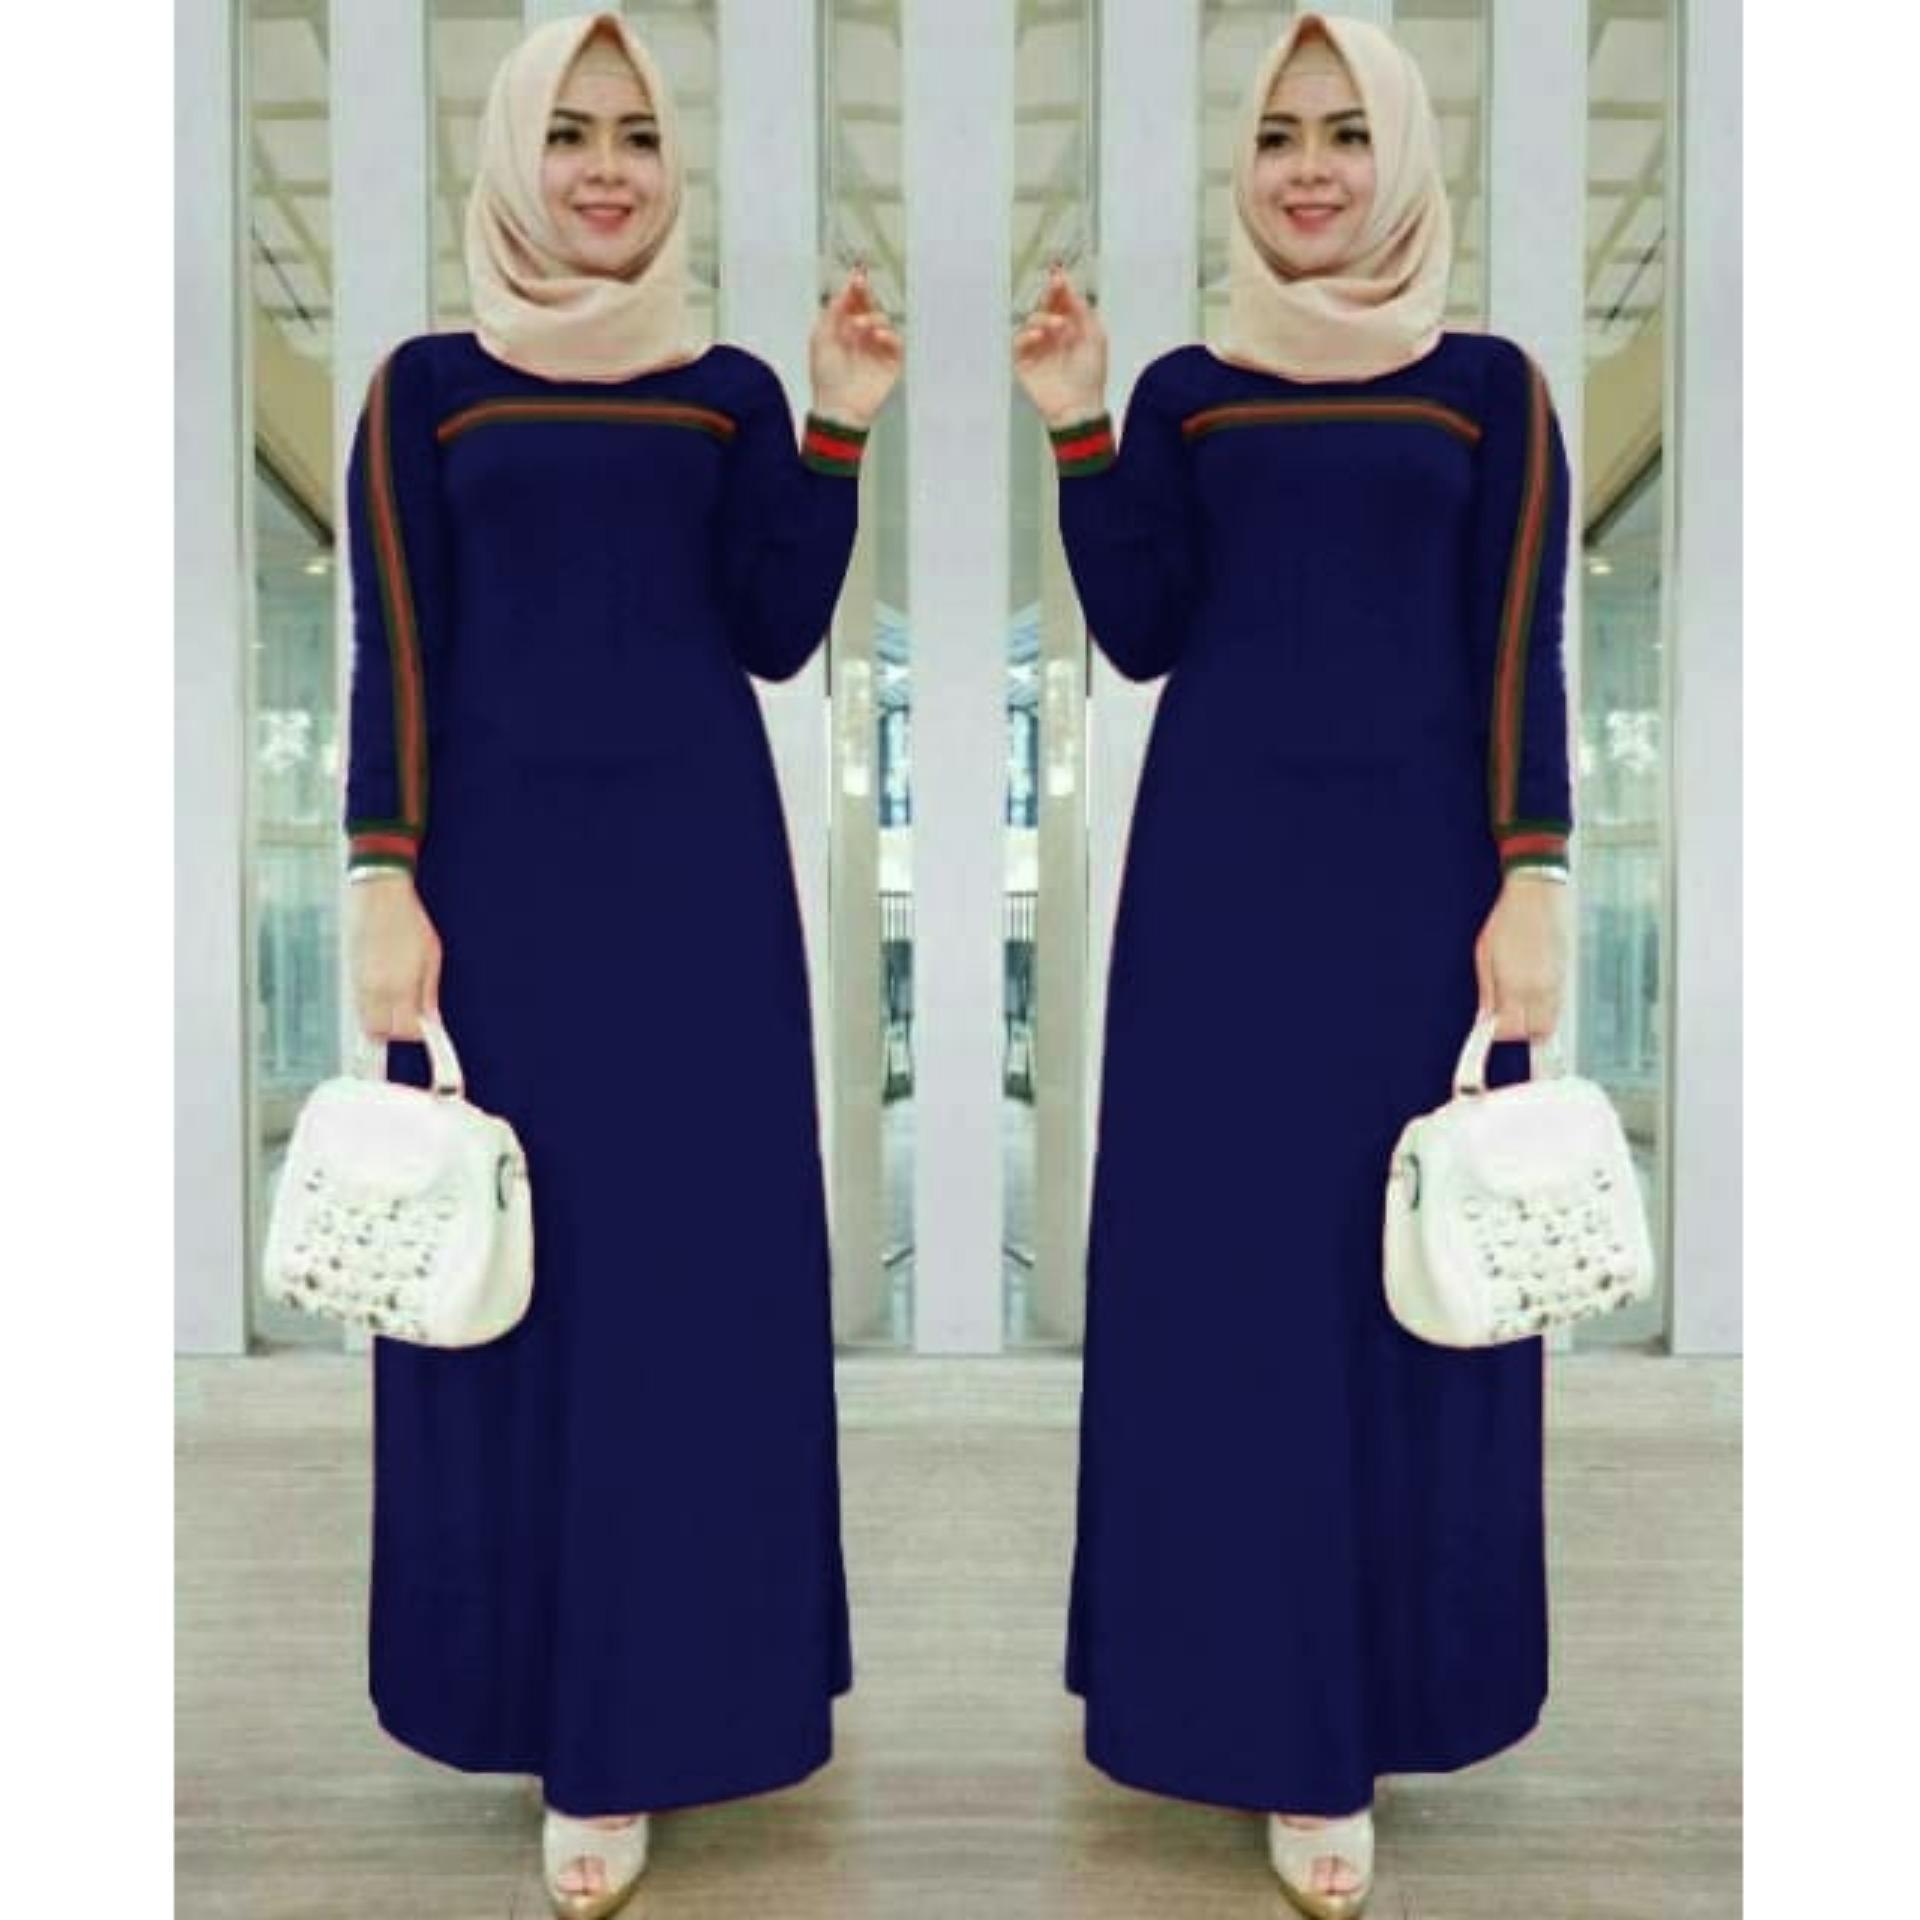 Vrichel - Maxi Dress / Long dress / Baju Muslim / Dress Wanita / Maxi Dress